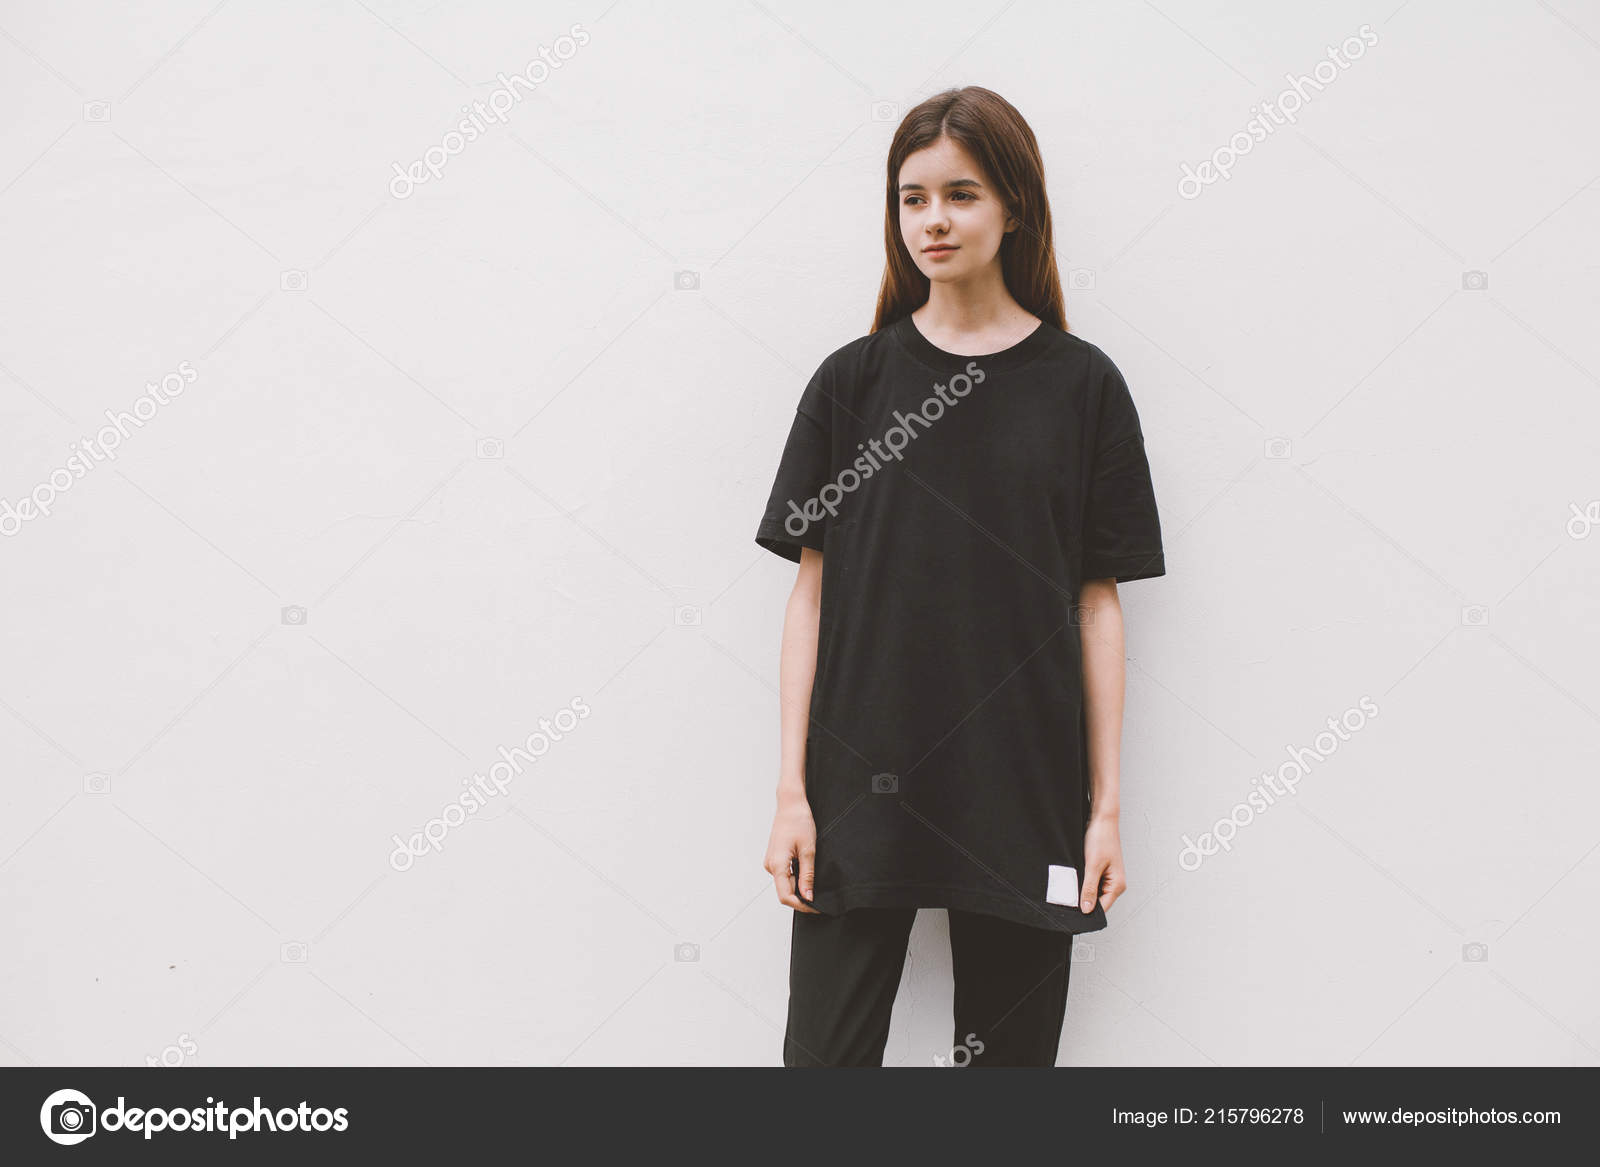 Dünne schwarze Mädchenpussy